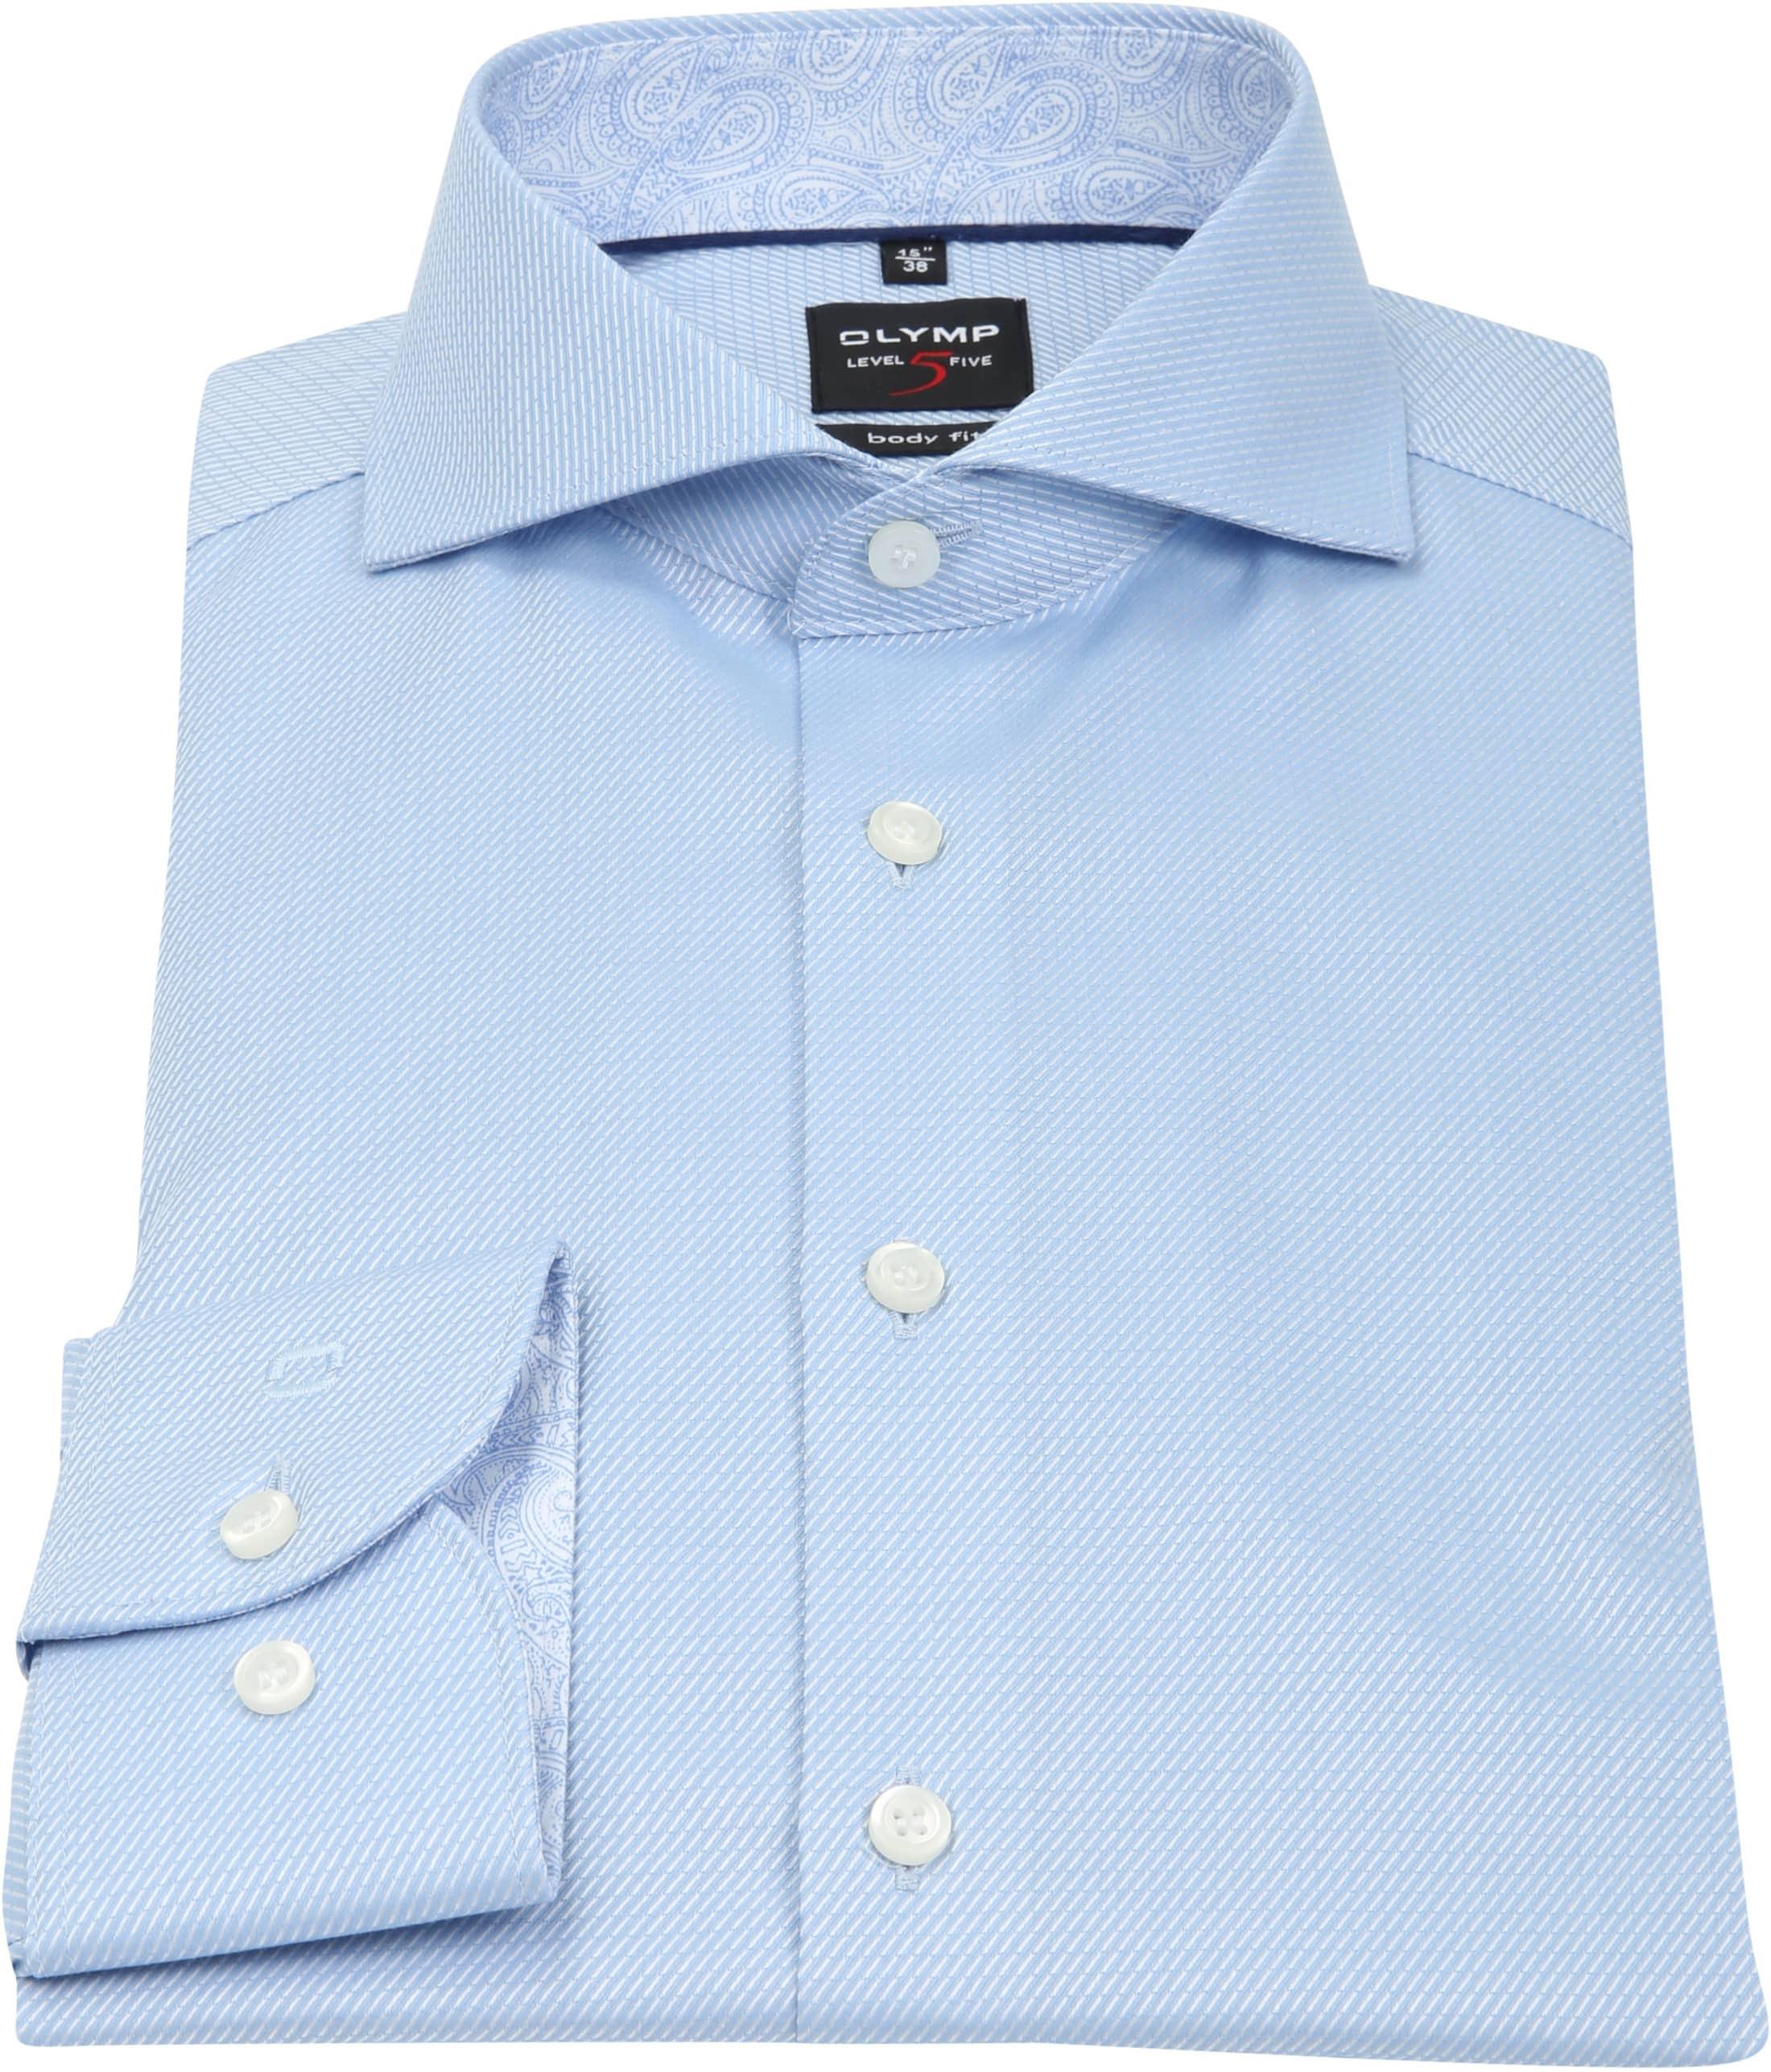 OLYMP Overhemd Level 5 BF Light Blue foto 3